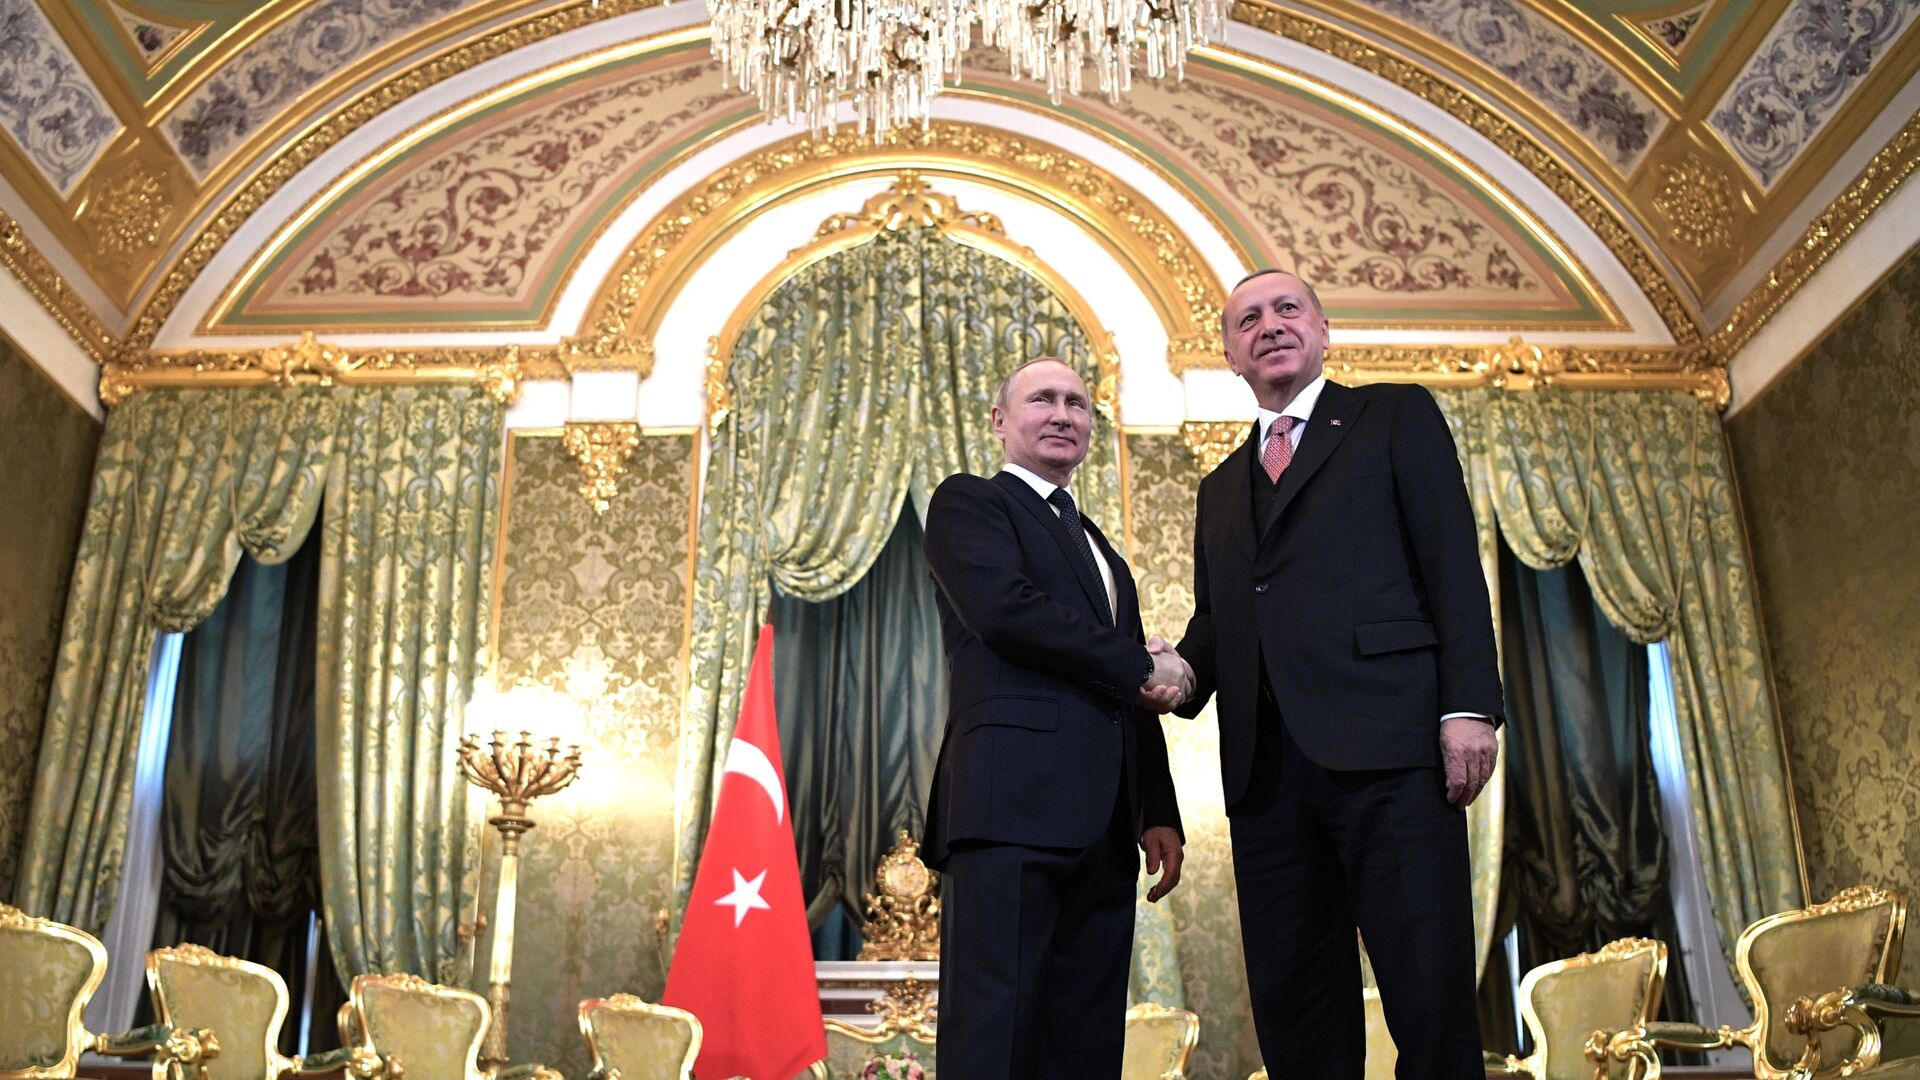 Президент РФ Владимир Путин и президент Турции Реджеп Тайип Эрдоган во время встречи - Sputnik Азербайджан, 1920, 27.09.2021